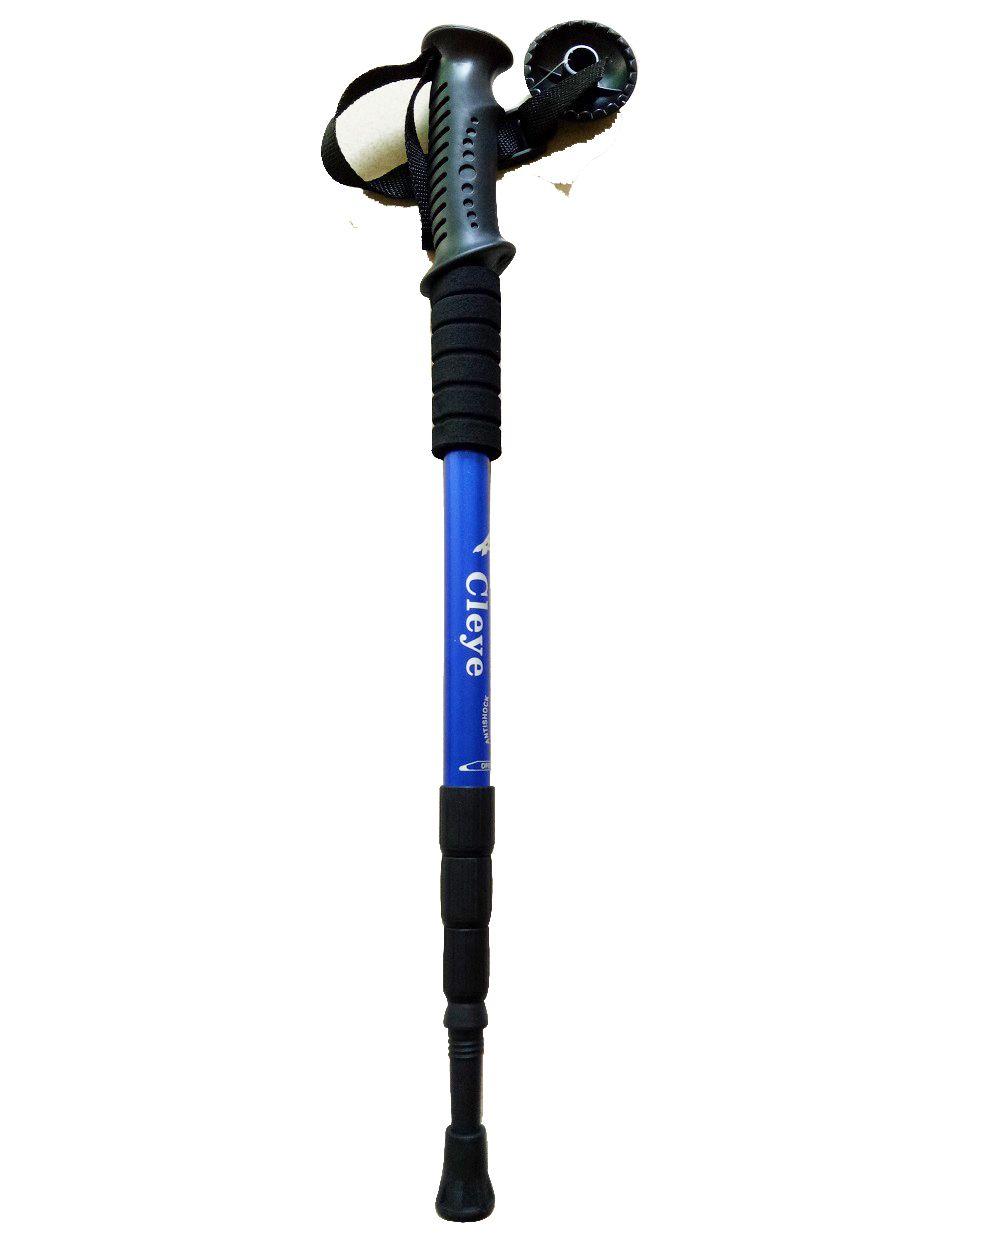 GroßhandelAlleAnil Verstellbare Trekking Wanderköpfe Pole Alpenstock Anti-Shock-Wandern Camping Trekking-Polen Ultraleicht Outdoor-Ausrüstung